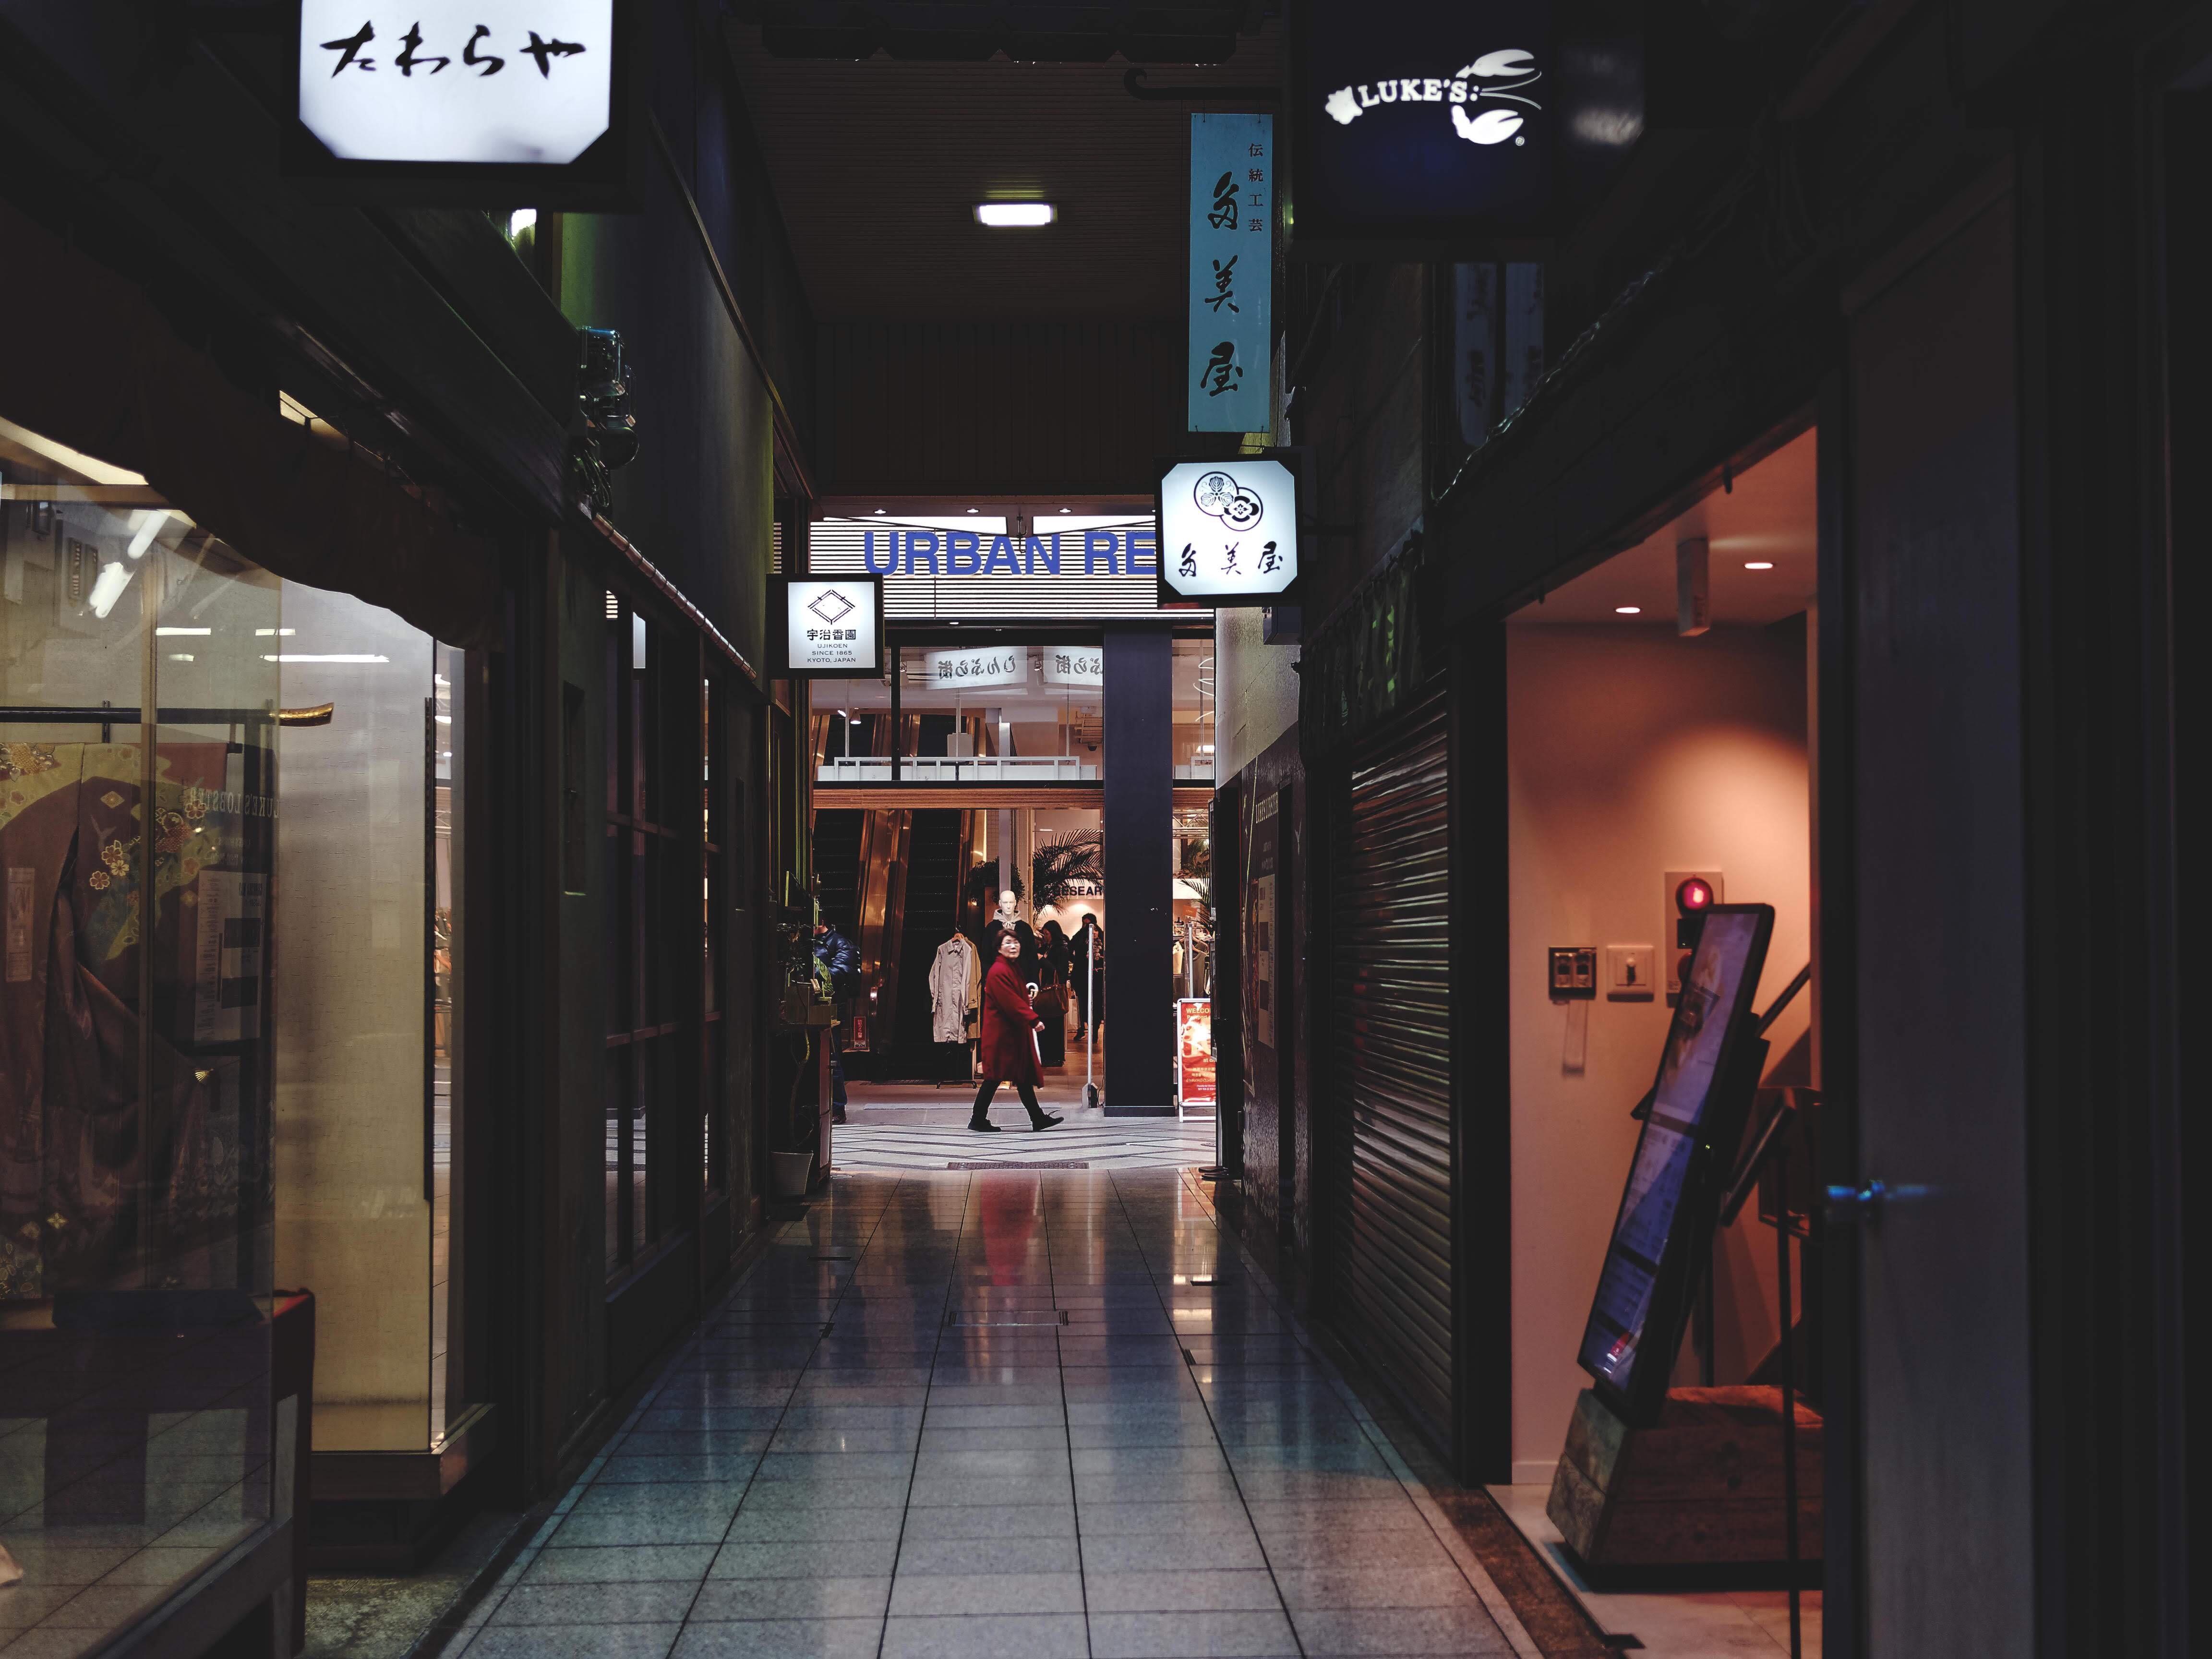 f:id:yuuki89:20190222230720j:image